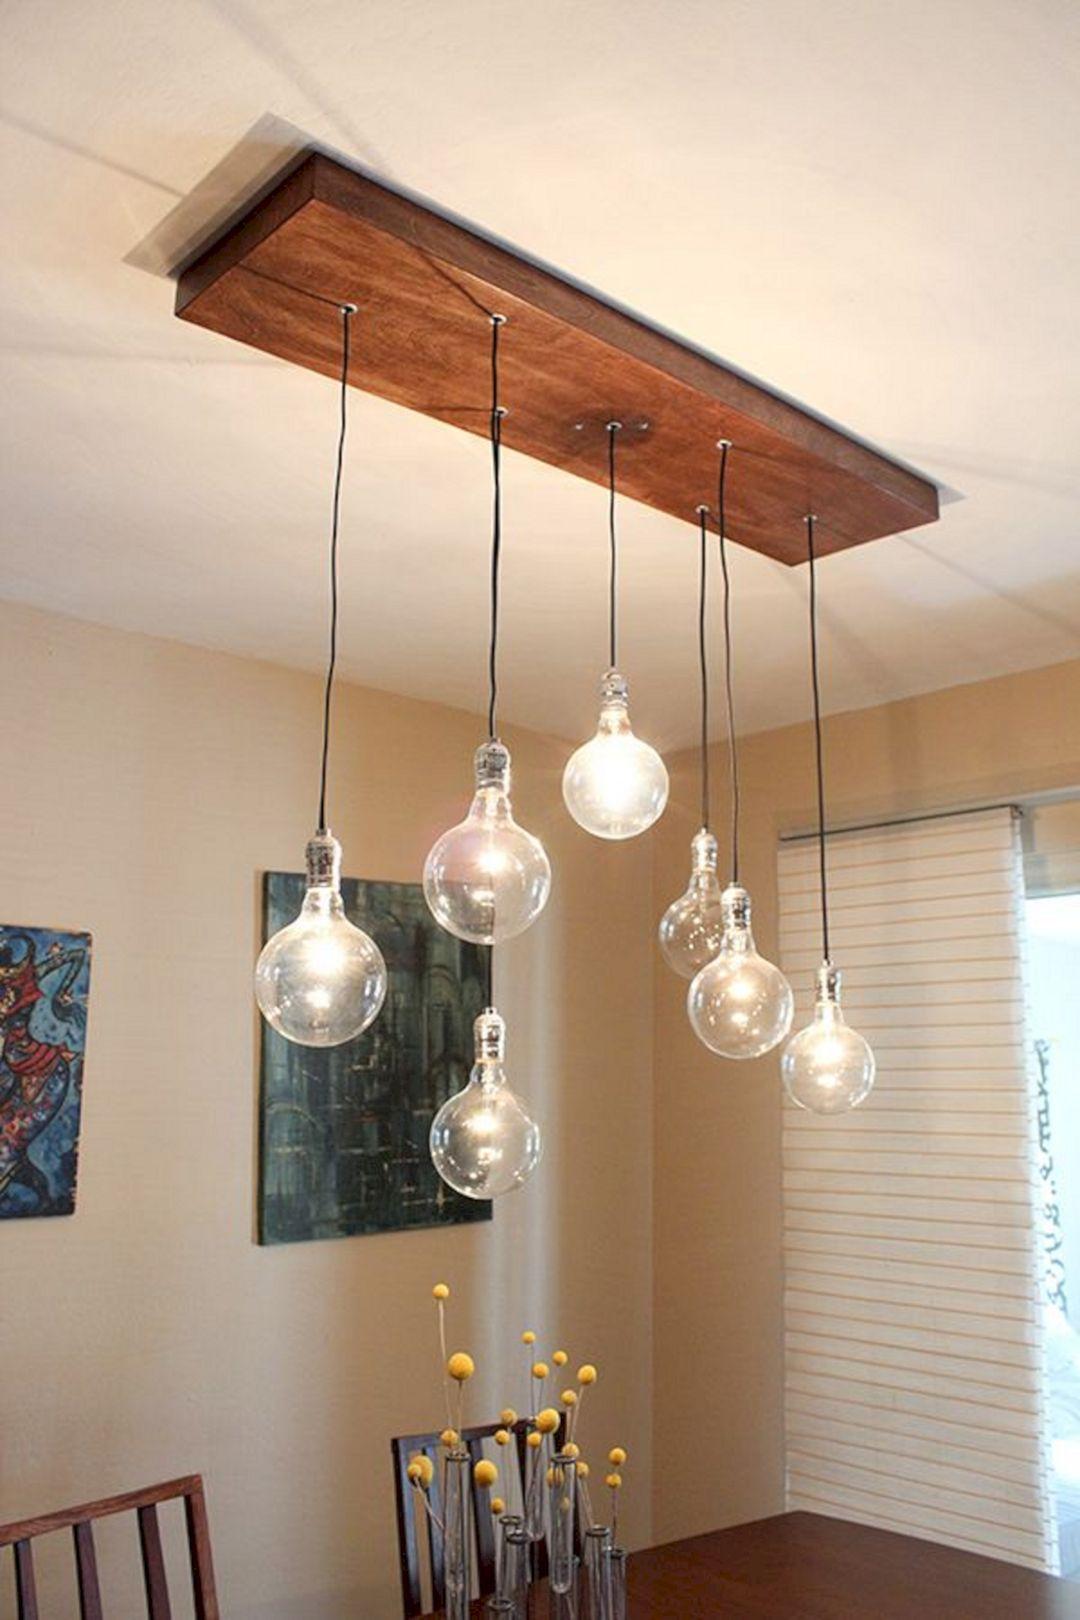 28 Rustic Lighting Design Ideas For Awesome Dining Room Decoration Lampu Gantung Dekorasi Kreatif Lampu